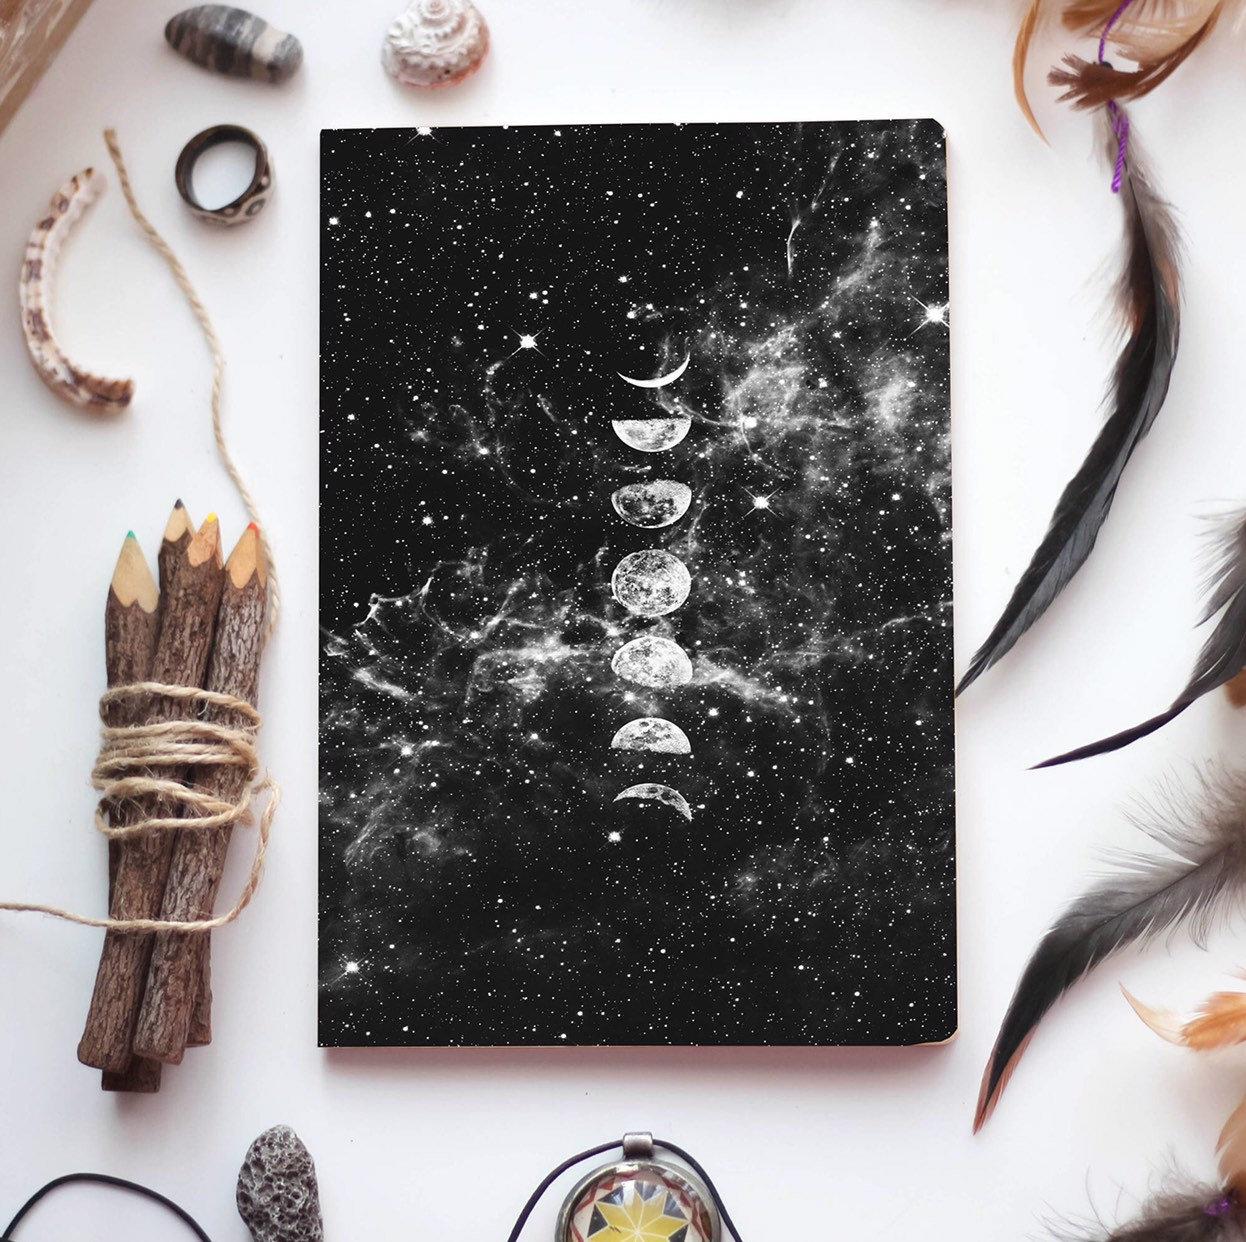 Moon Bullet Journal, Moon Notebook, Moon Phase Journal, Yoga Journal,  Bullet Journal Notebook, Moon Planner, Gift, Disry, Book Of Shadows for Om Journal Lunar Calendar